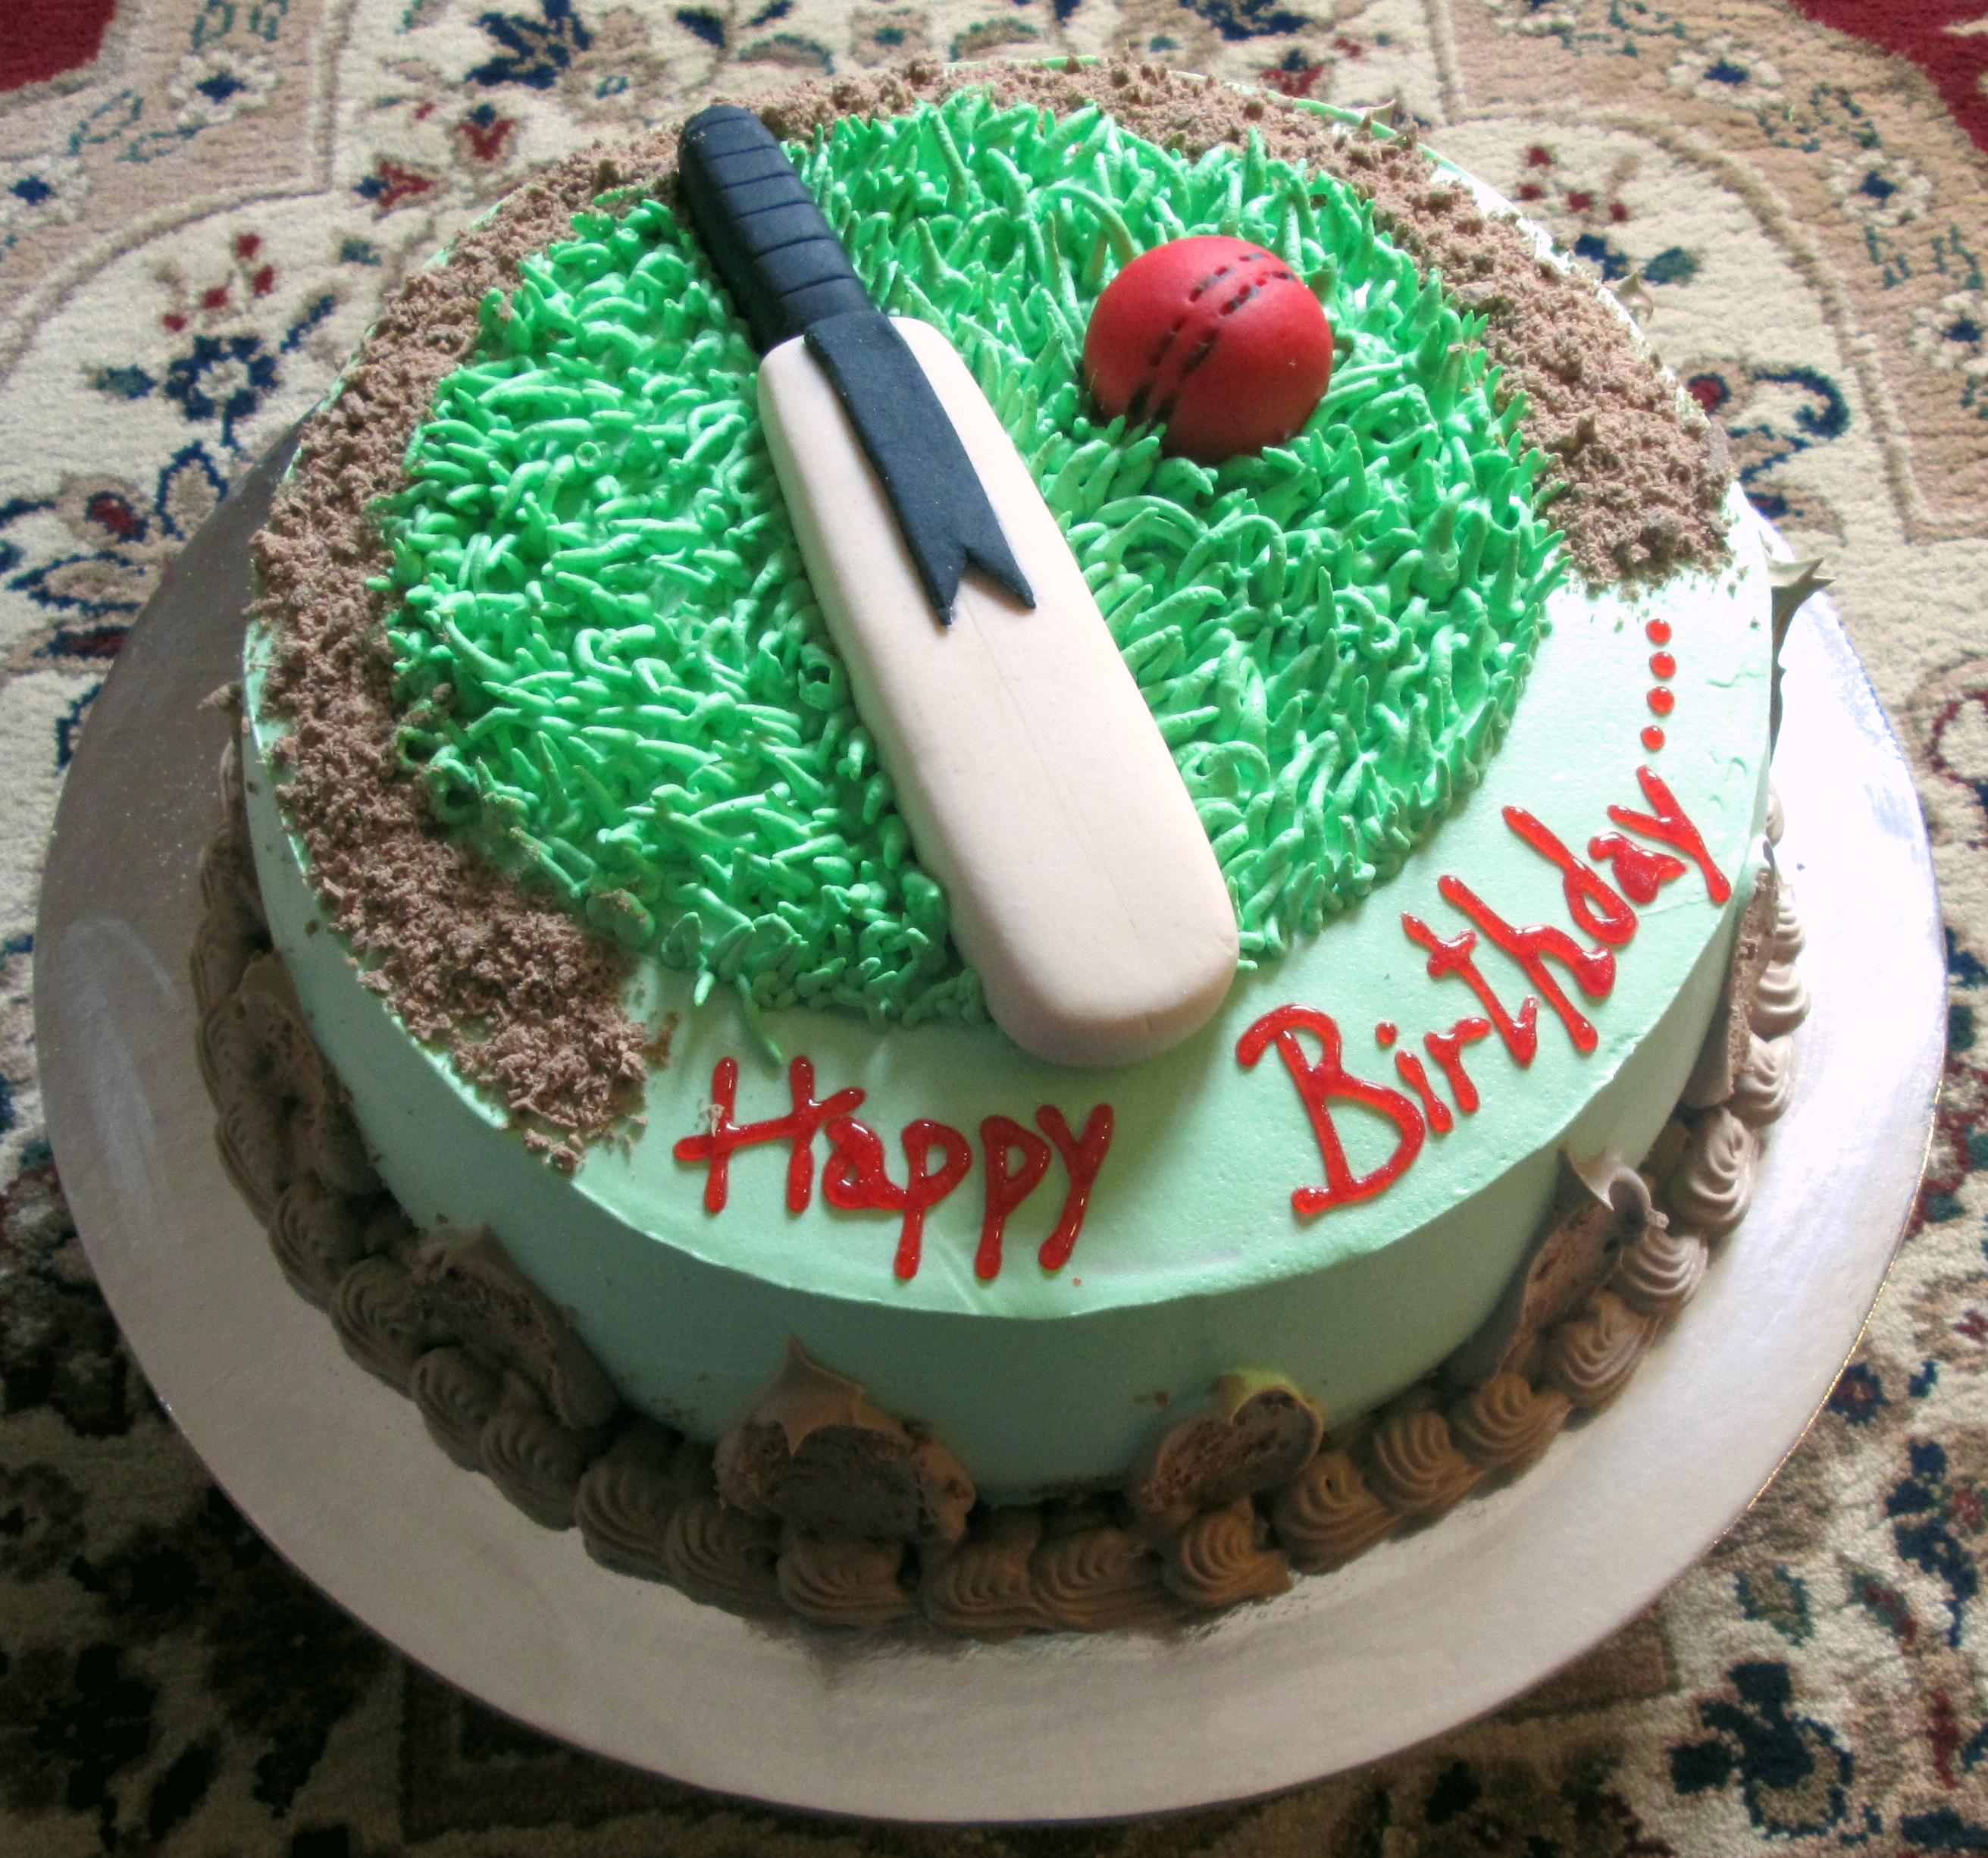 Cricket bat ball.jpg